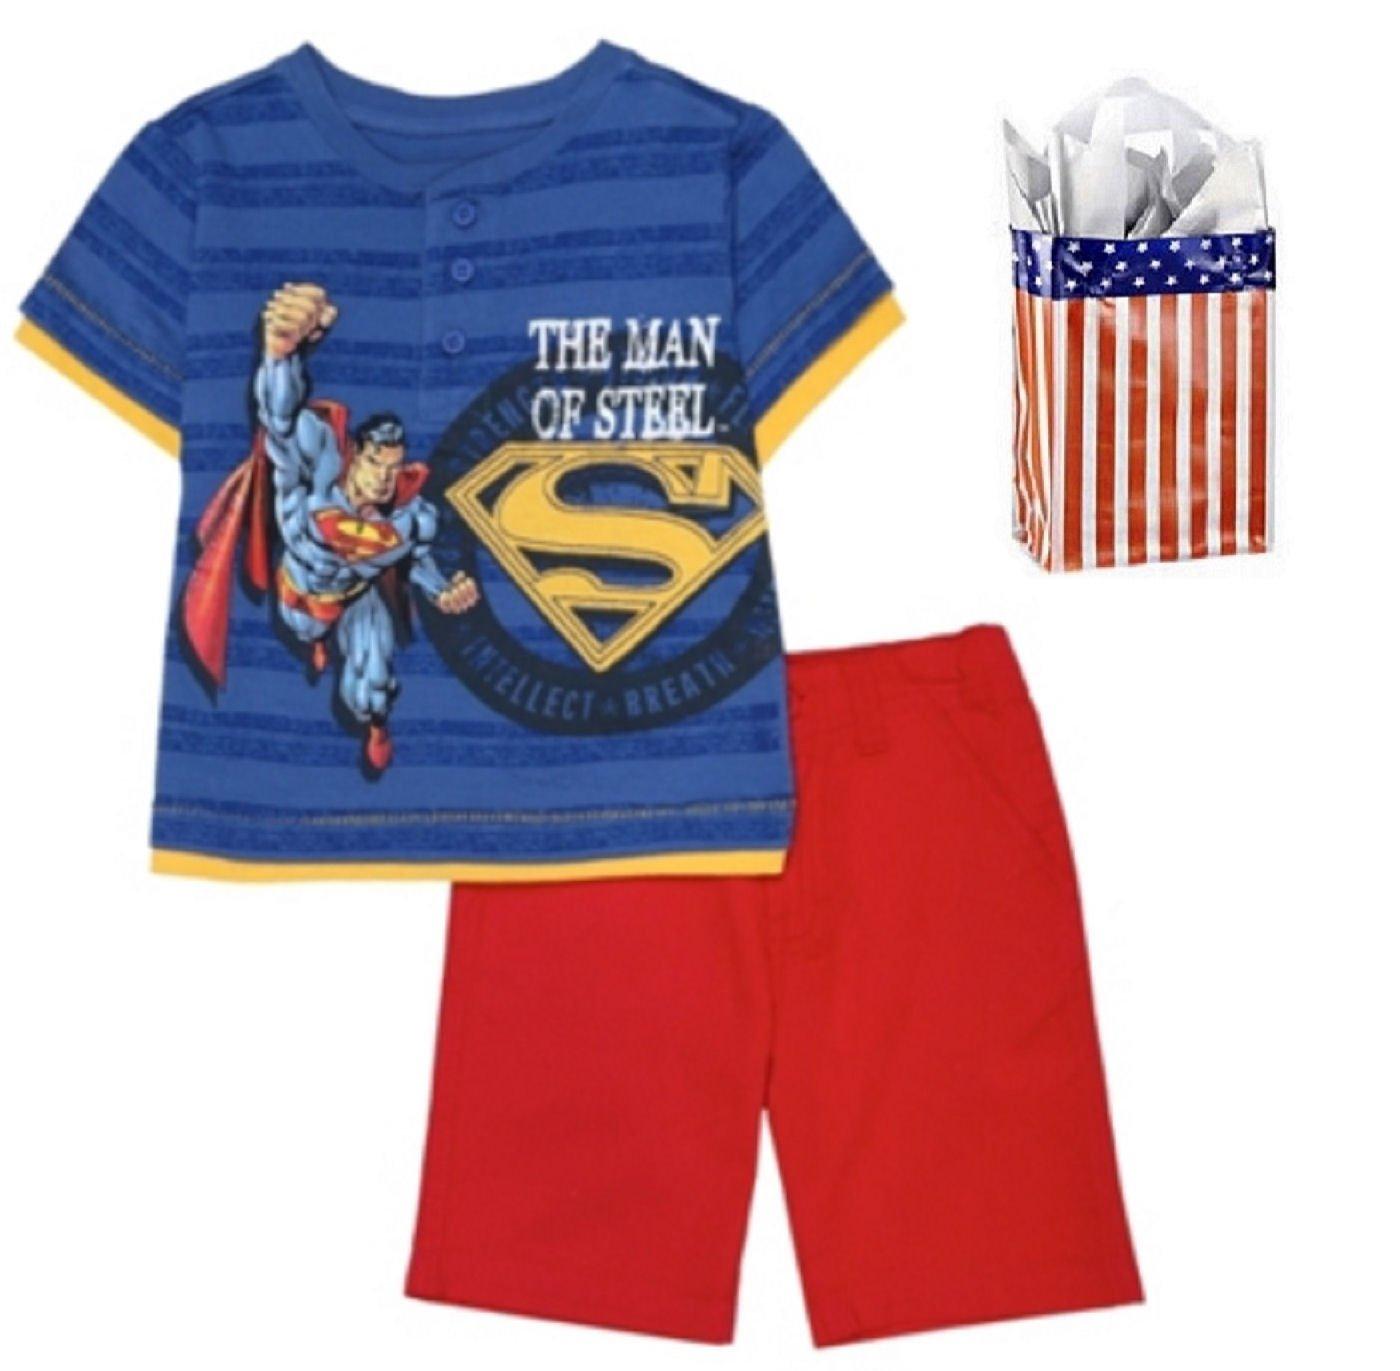 Superman Little Boys' The Man of Steel Shirt & Short Set & Bag - 3 Piece Gift Set (3T)